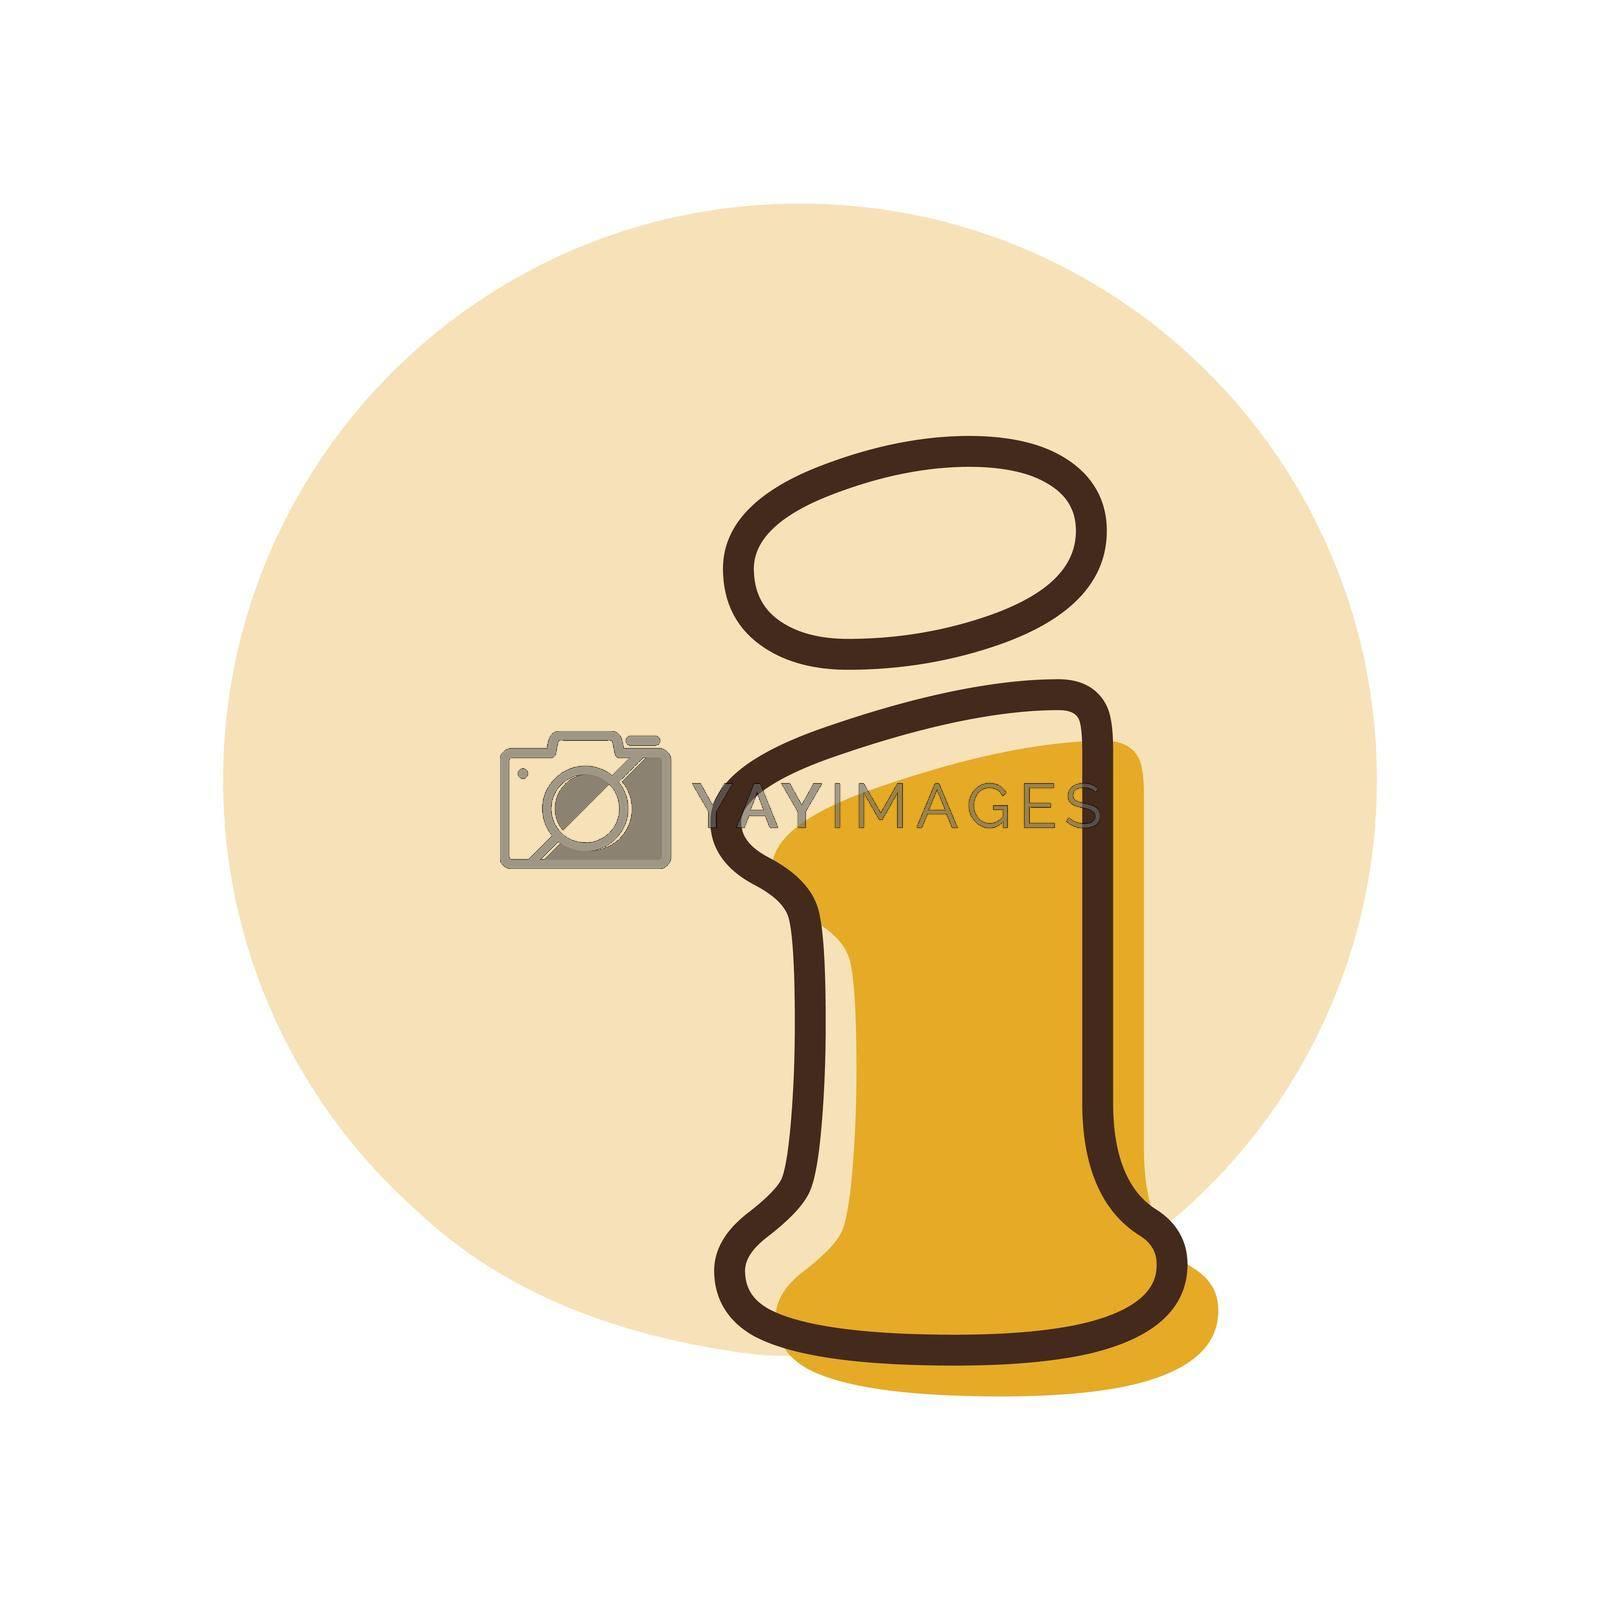 Information web icon. Help, FAQ. E-commerce sign. Graph symbol for your web site design, logo, app, UI. Vector illustration, EPS10.